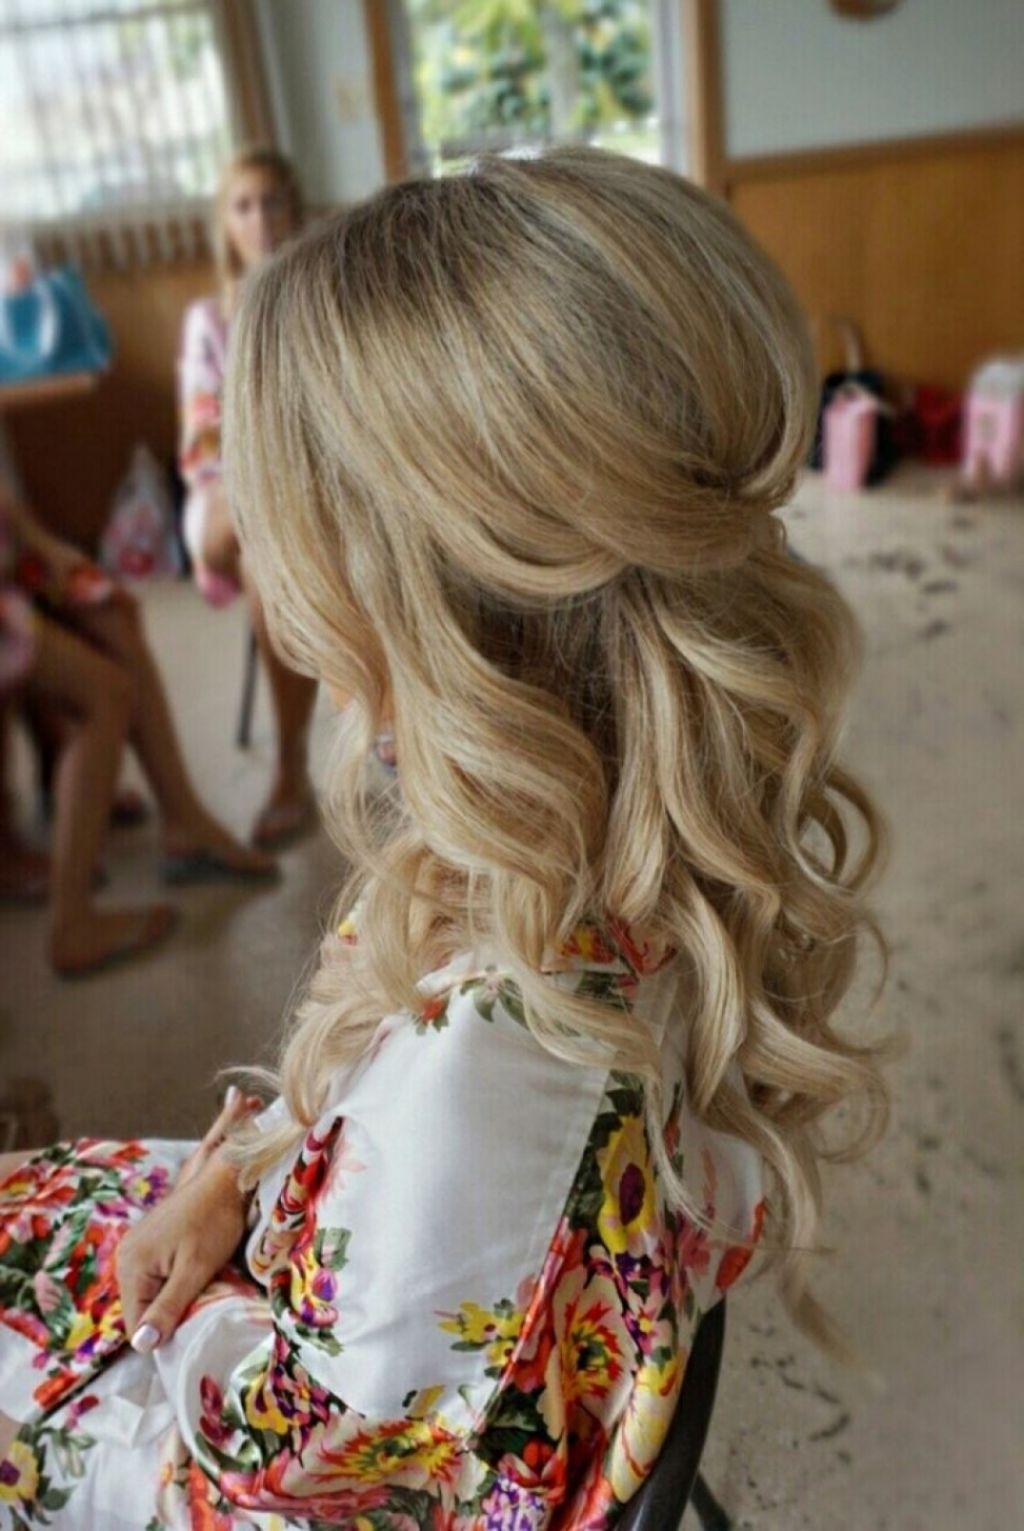 √ 24+ Wonderful Bridesmaid Hairstyles For Long Hair: Bridesmaid Inside Most Recent Wedding Hairstyles For Long Hair For Bridesmaids (View 14 of 15)